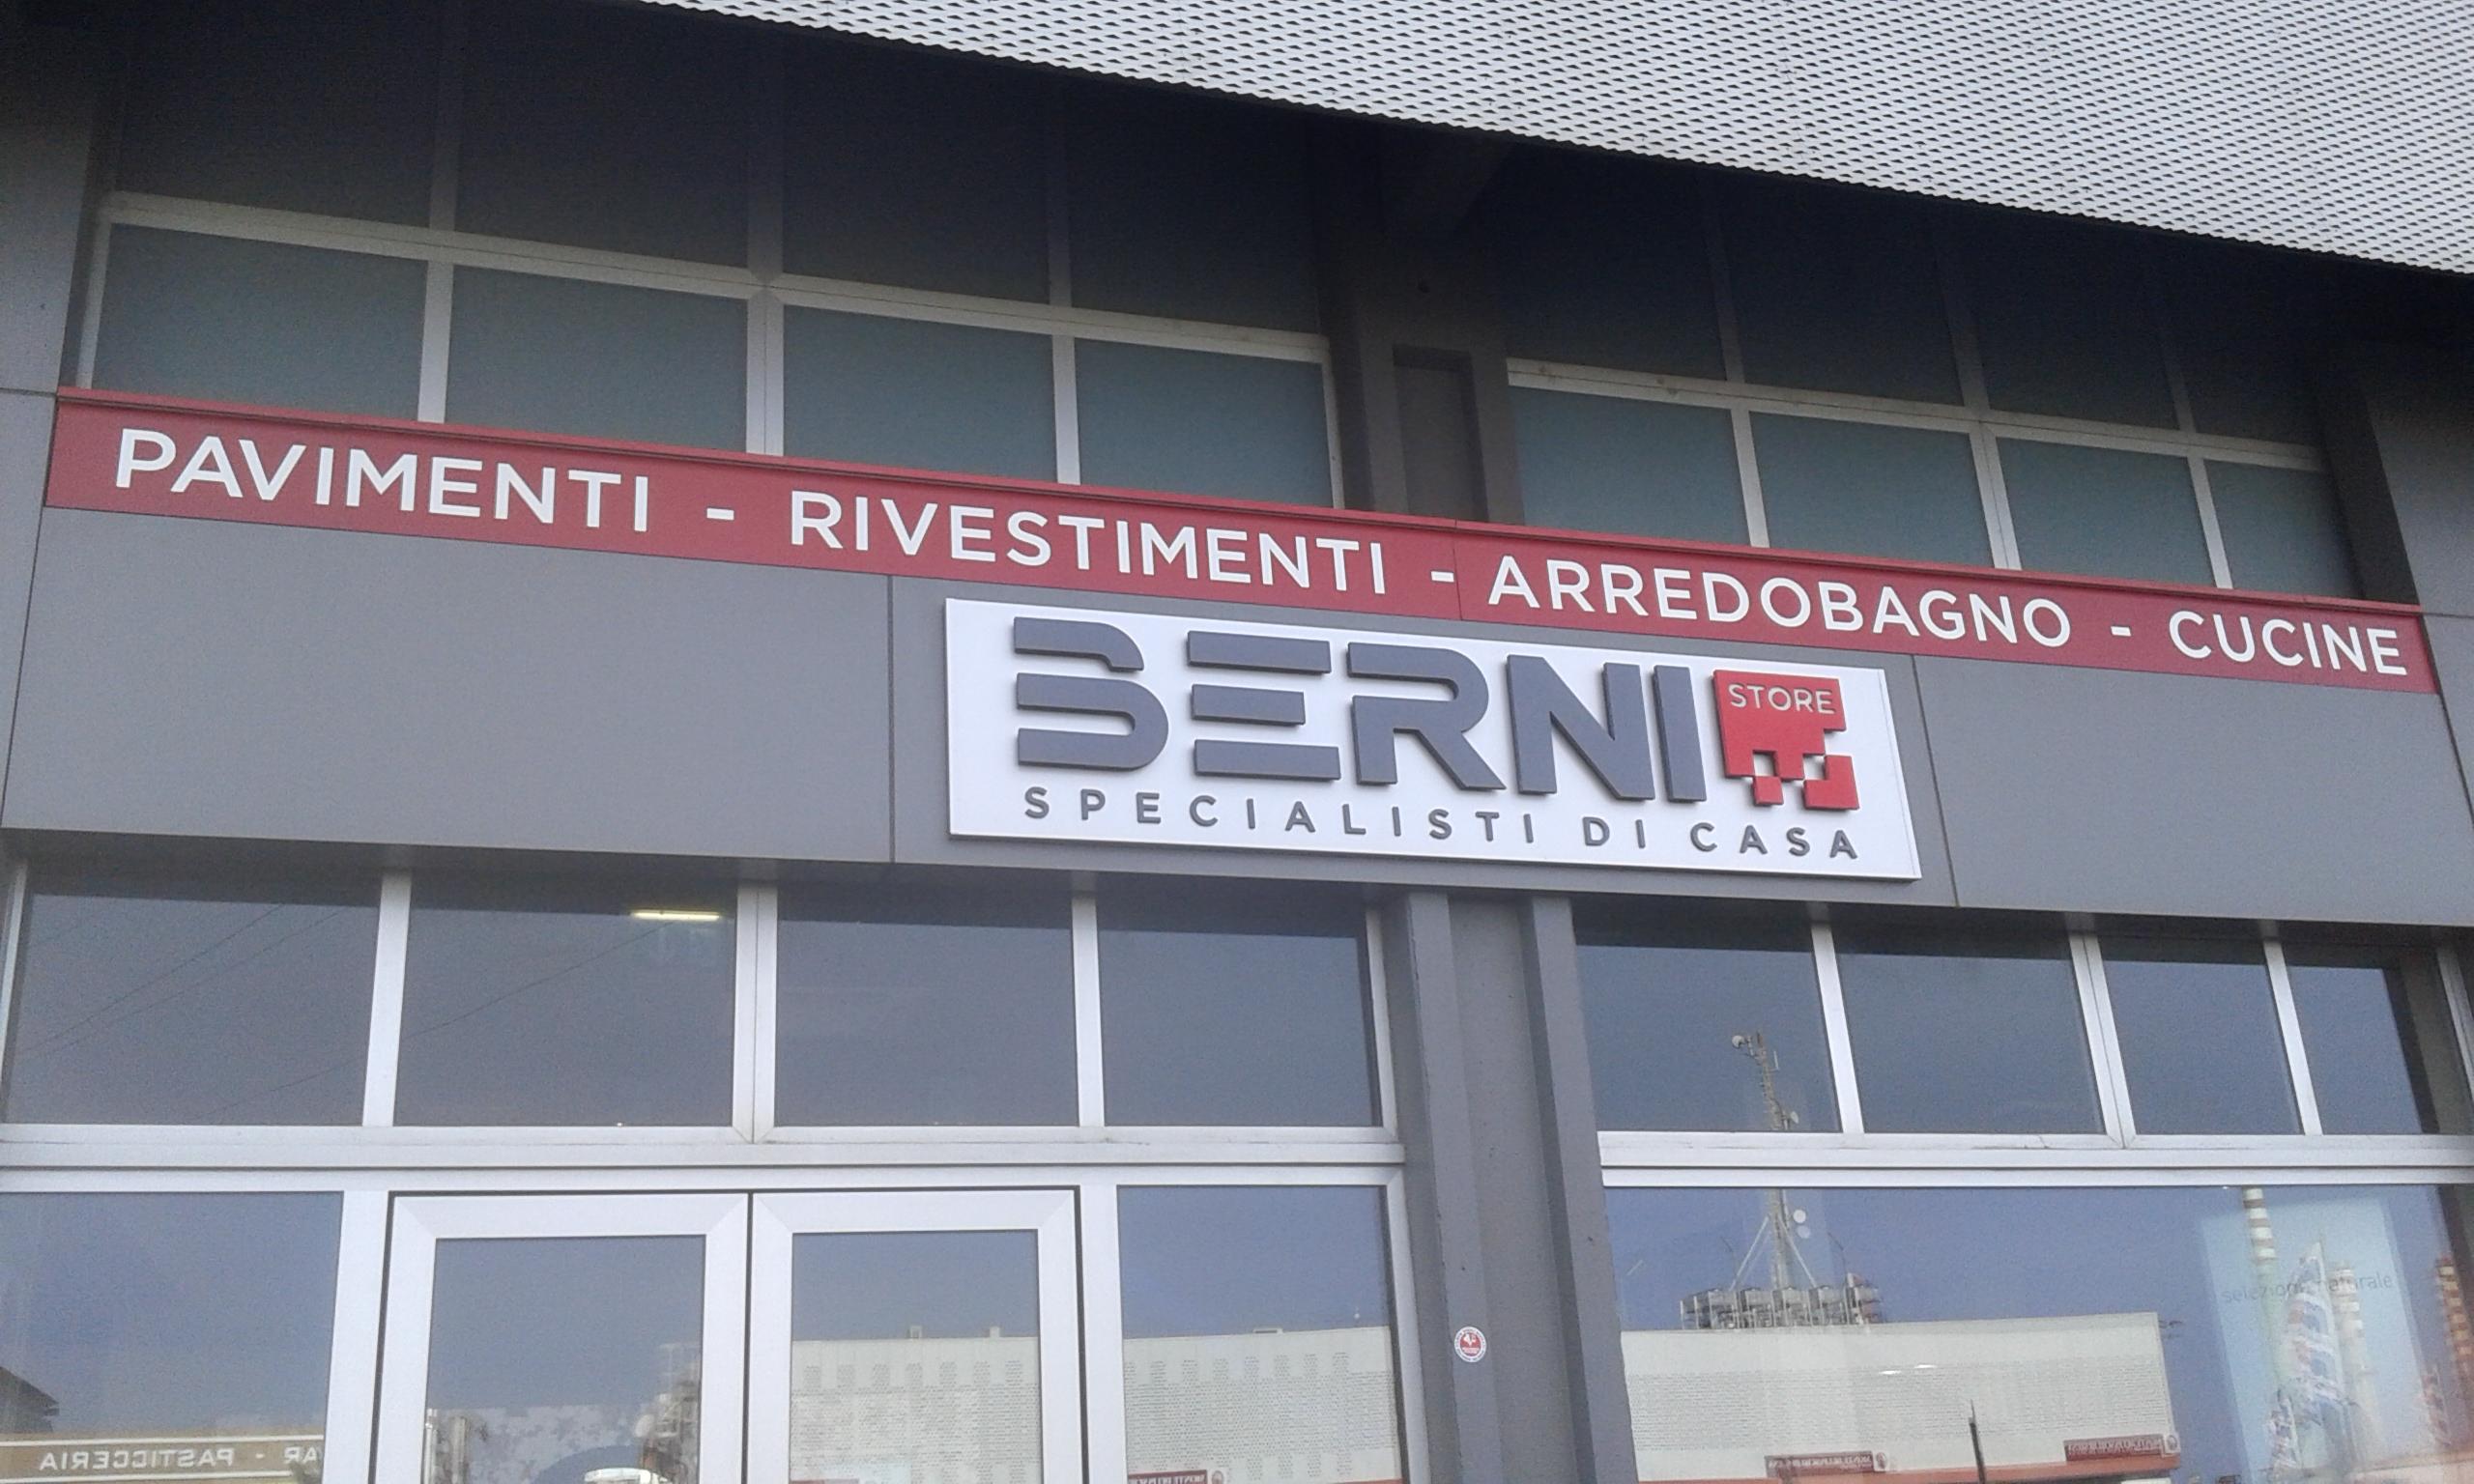 berni arredo bagno | sweetwaterrescue - Berni Arredo Bagno